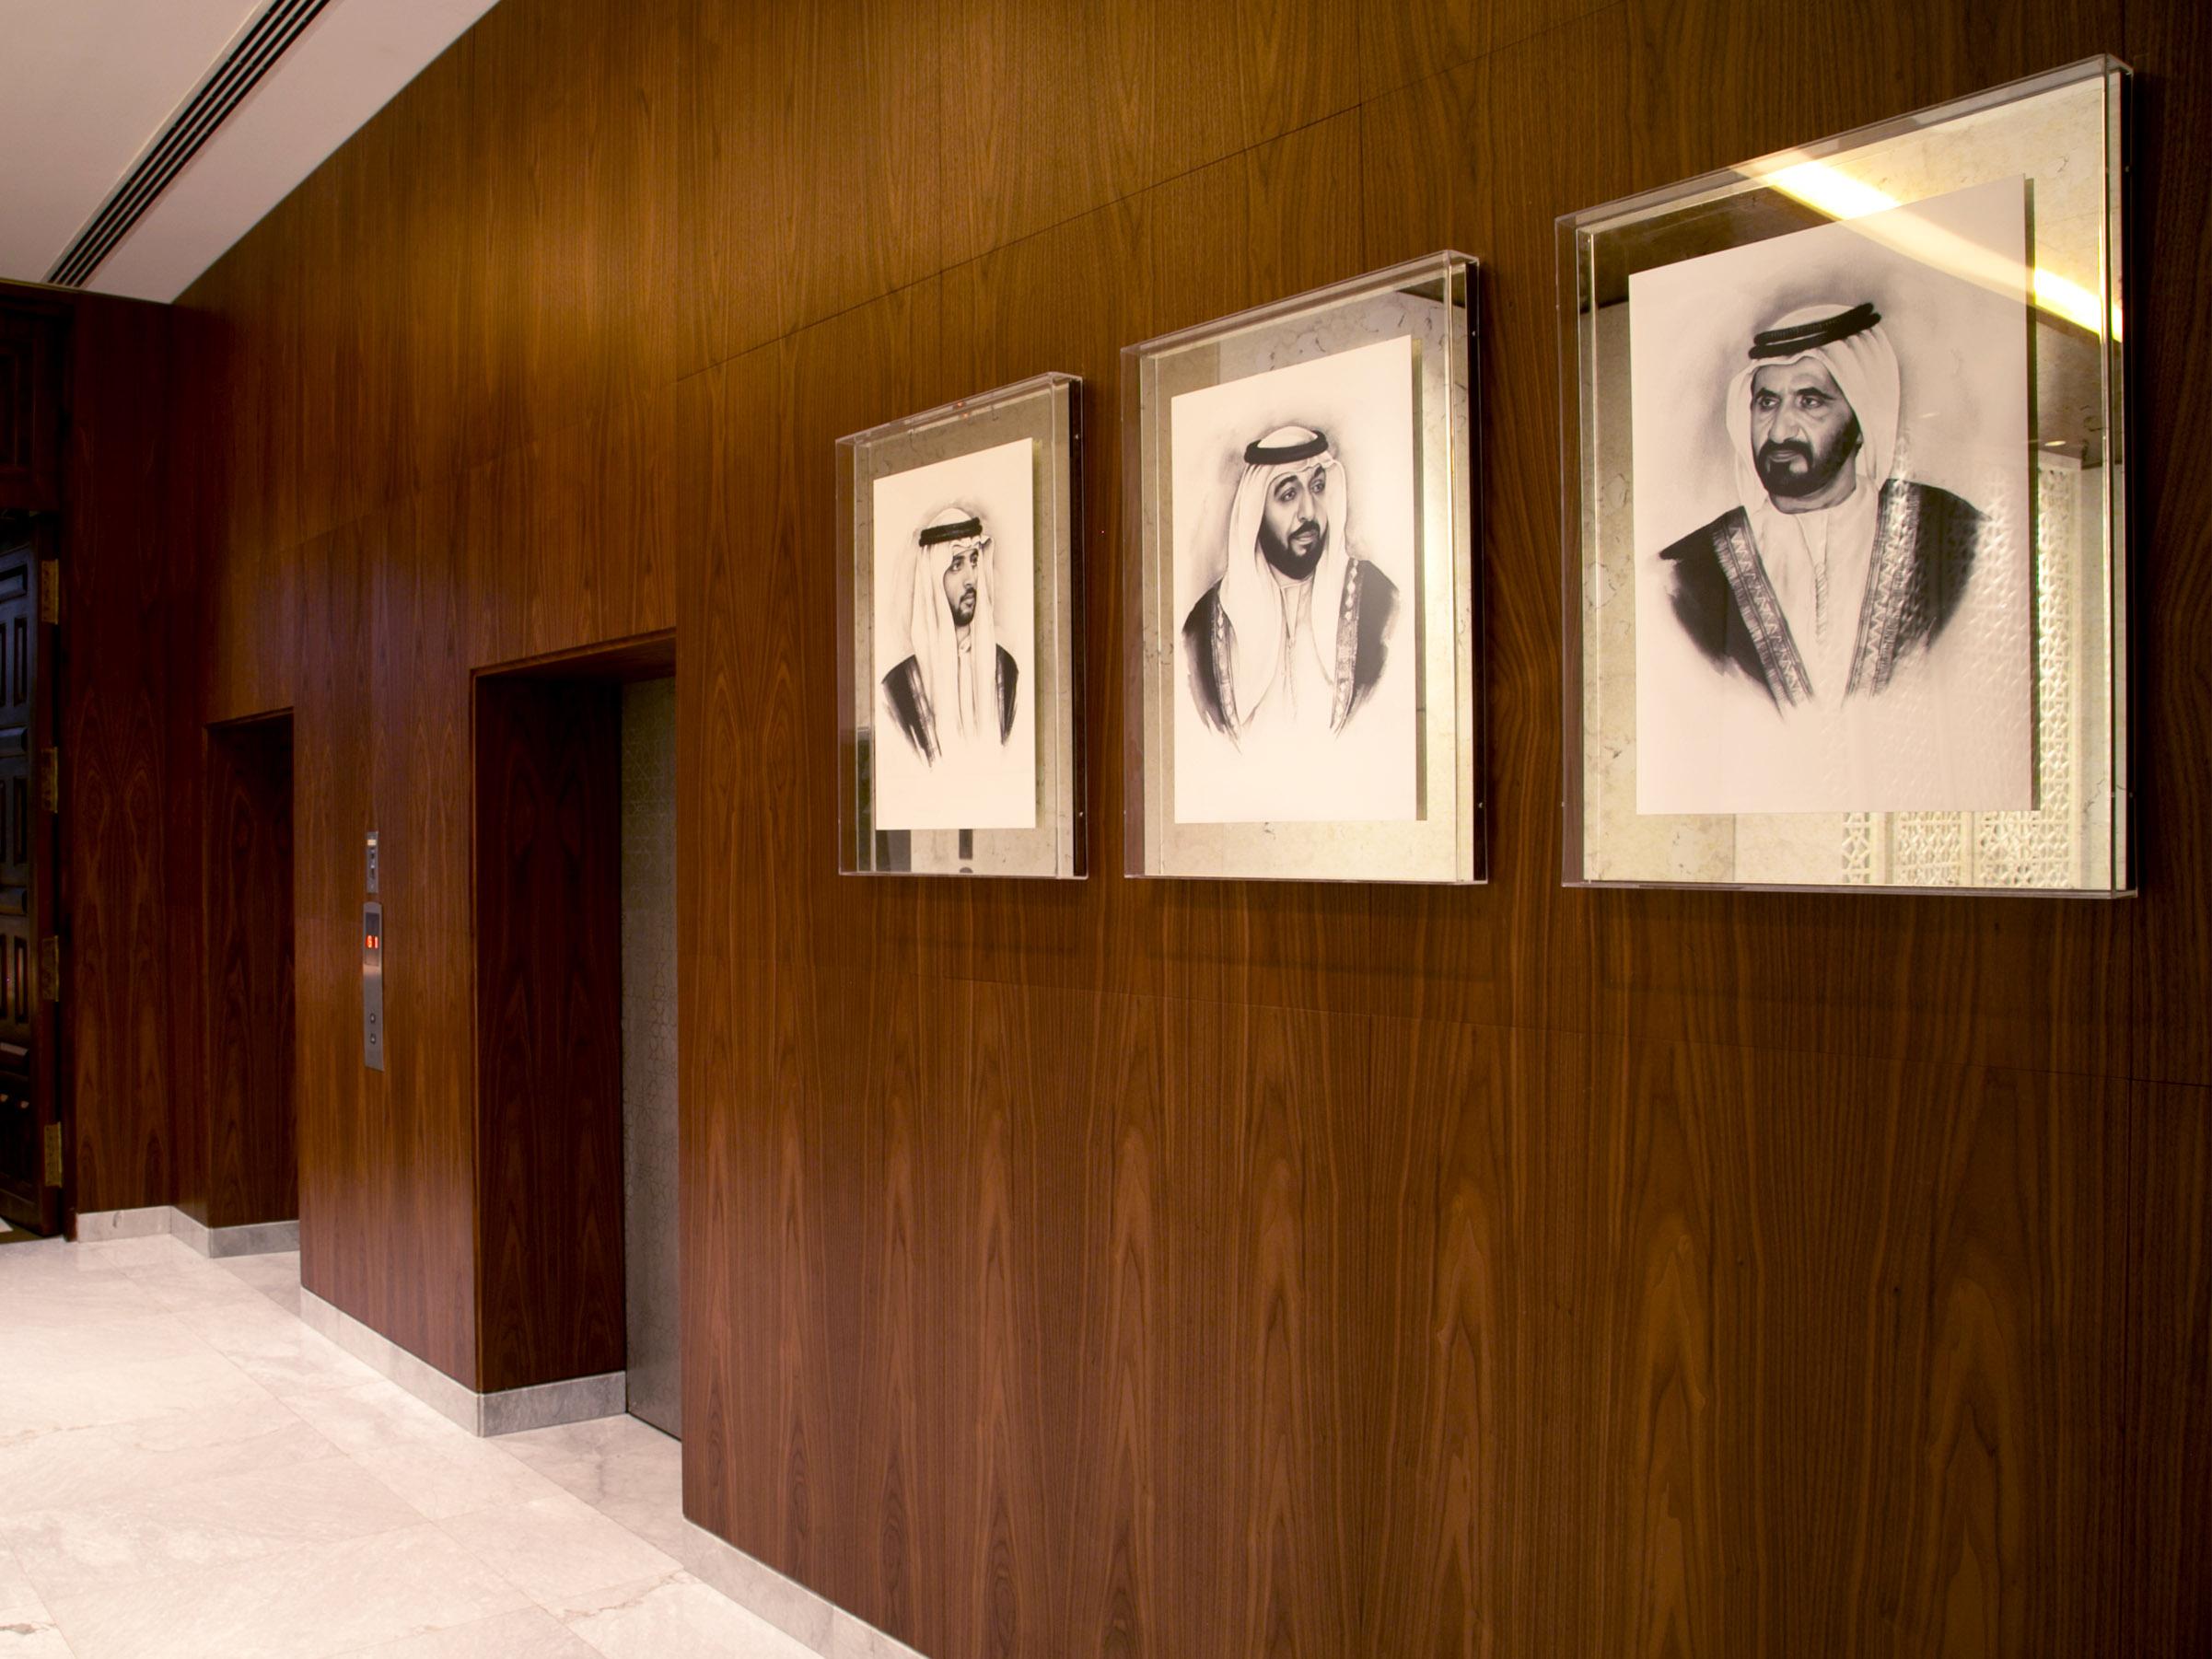 06-capsule-arts-projects-al-manzil-downtown-sheikh-portraits.jpg